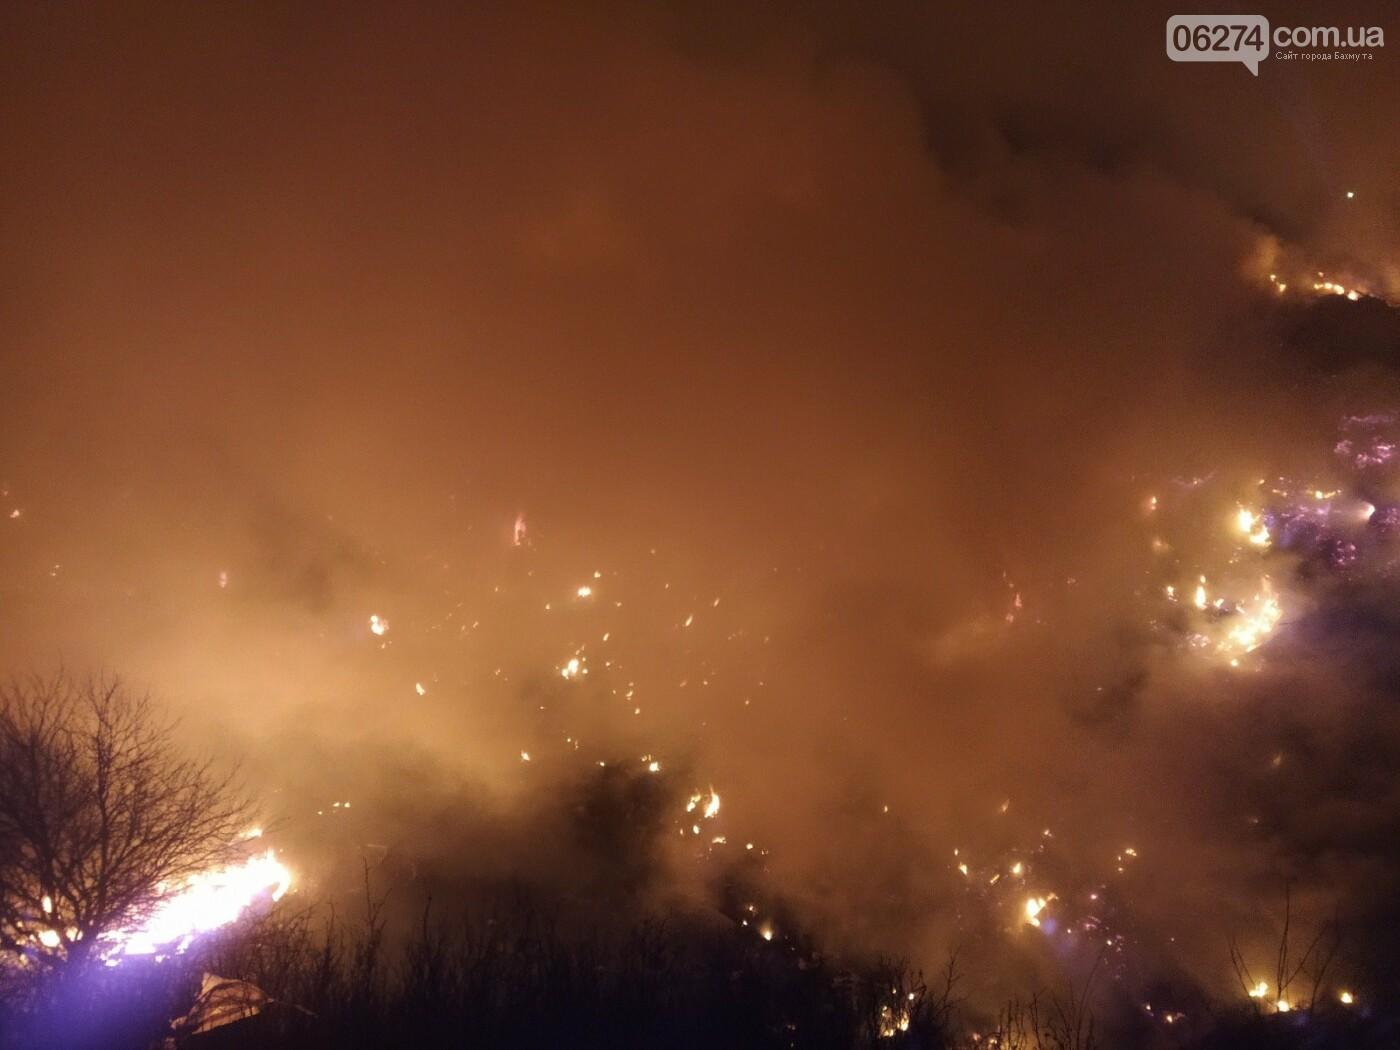 Спасатели ликвидировали пожар на полигоне ТБО вблизи Бахмута, фото-2